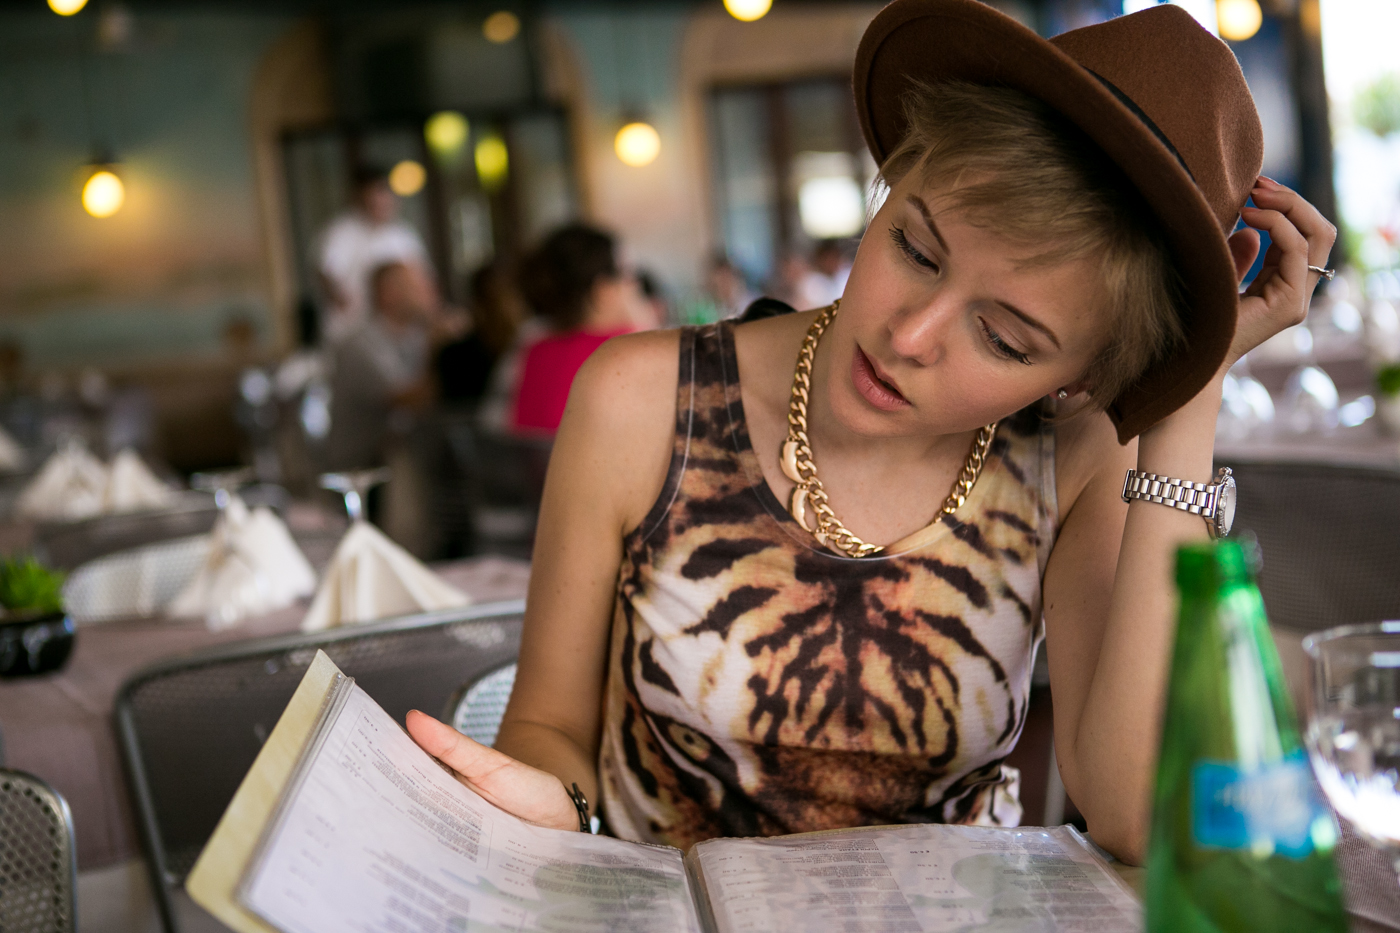 thecablook darya kamalova fashion blog street style denim shorts ash booties hm hat iseo lake piramidi di zona brescia-34